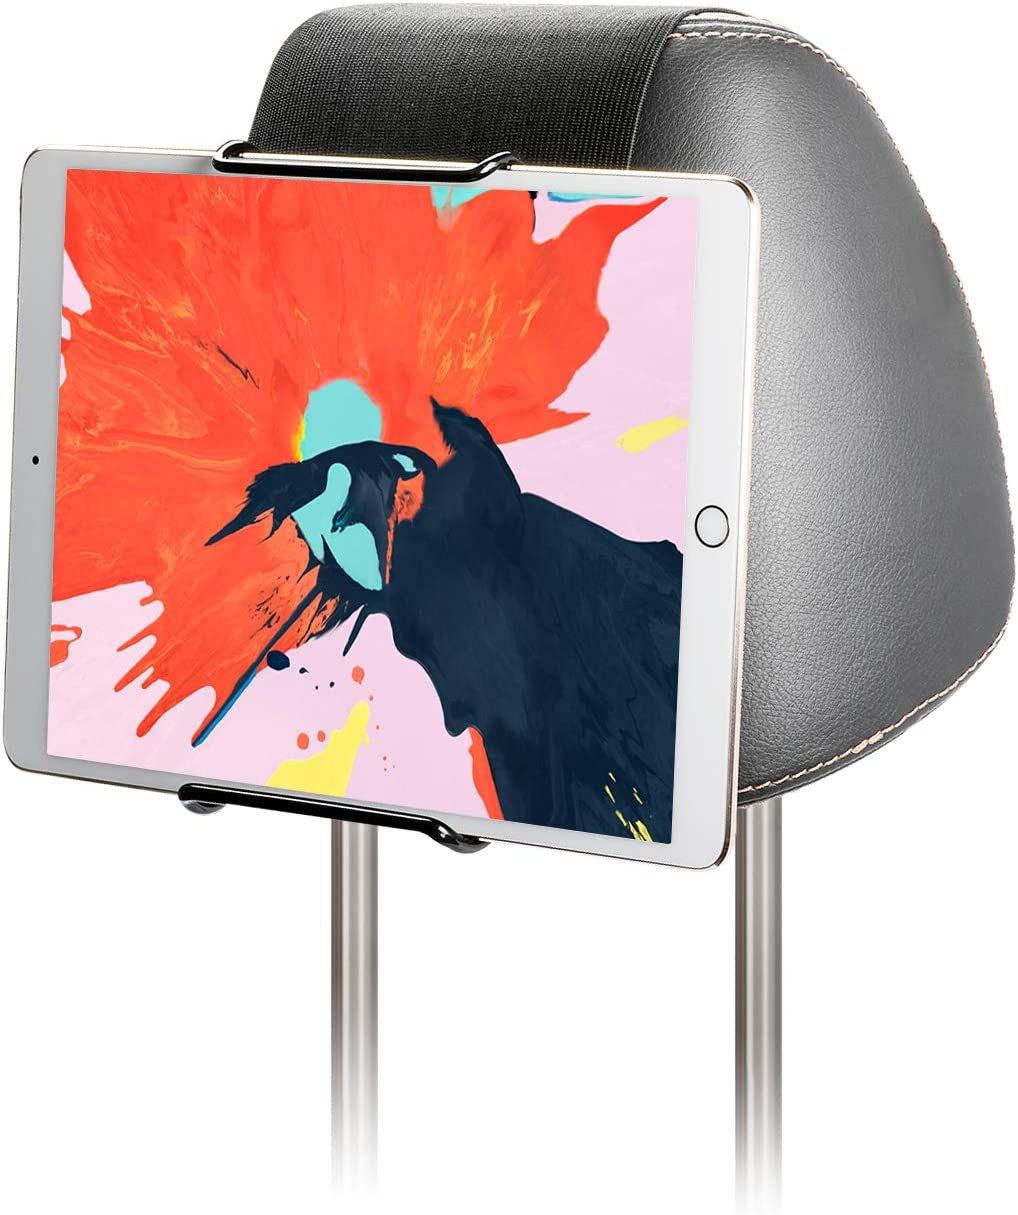 "Hikig Car Headrest Mount Holder for 7-11"" Tablets, Apple iPad, iPad Mini/Air/Pro, Samsung Galaxy Tabs - Adjustable Strap Fits Most Headrests, Universal Car Headrest Mount for Most Tablets - Black"